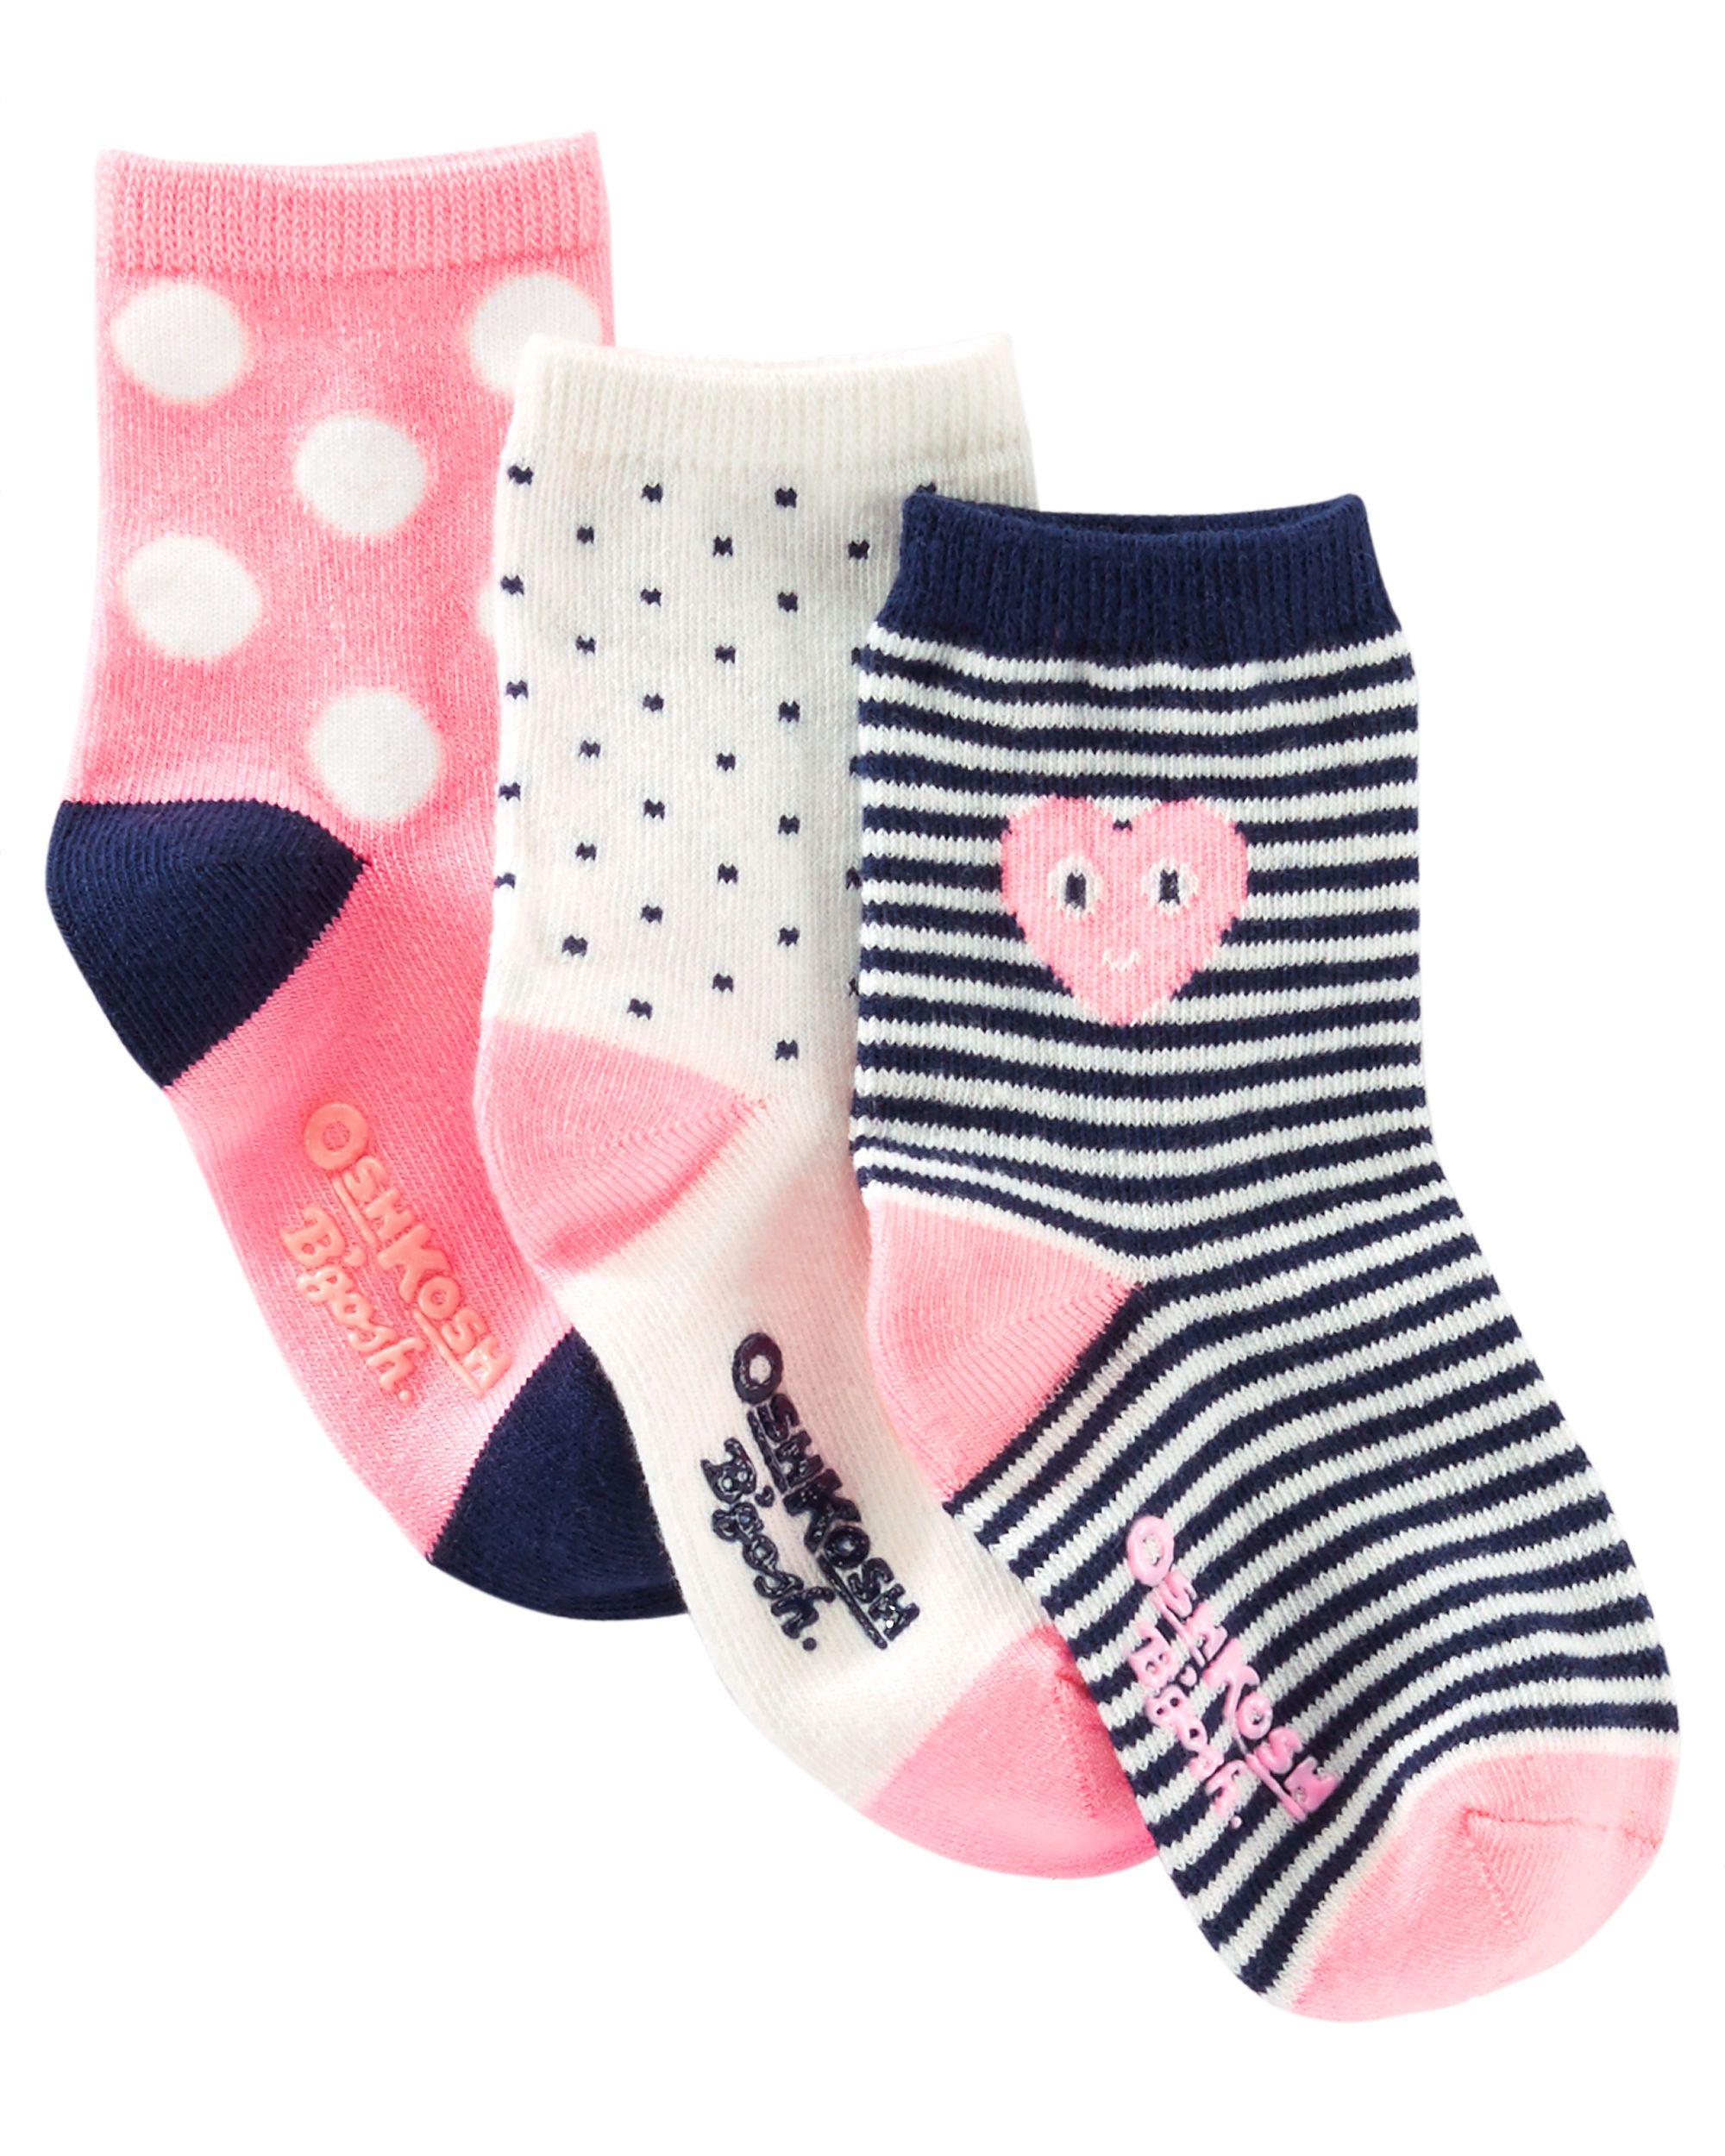 3-Pack Polka Dot Crew Socks | Ropa niña, Bebe y Ropa